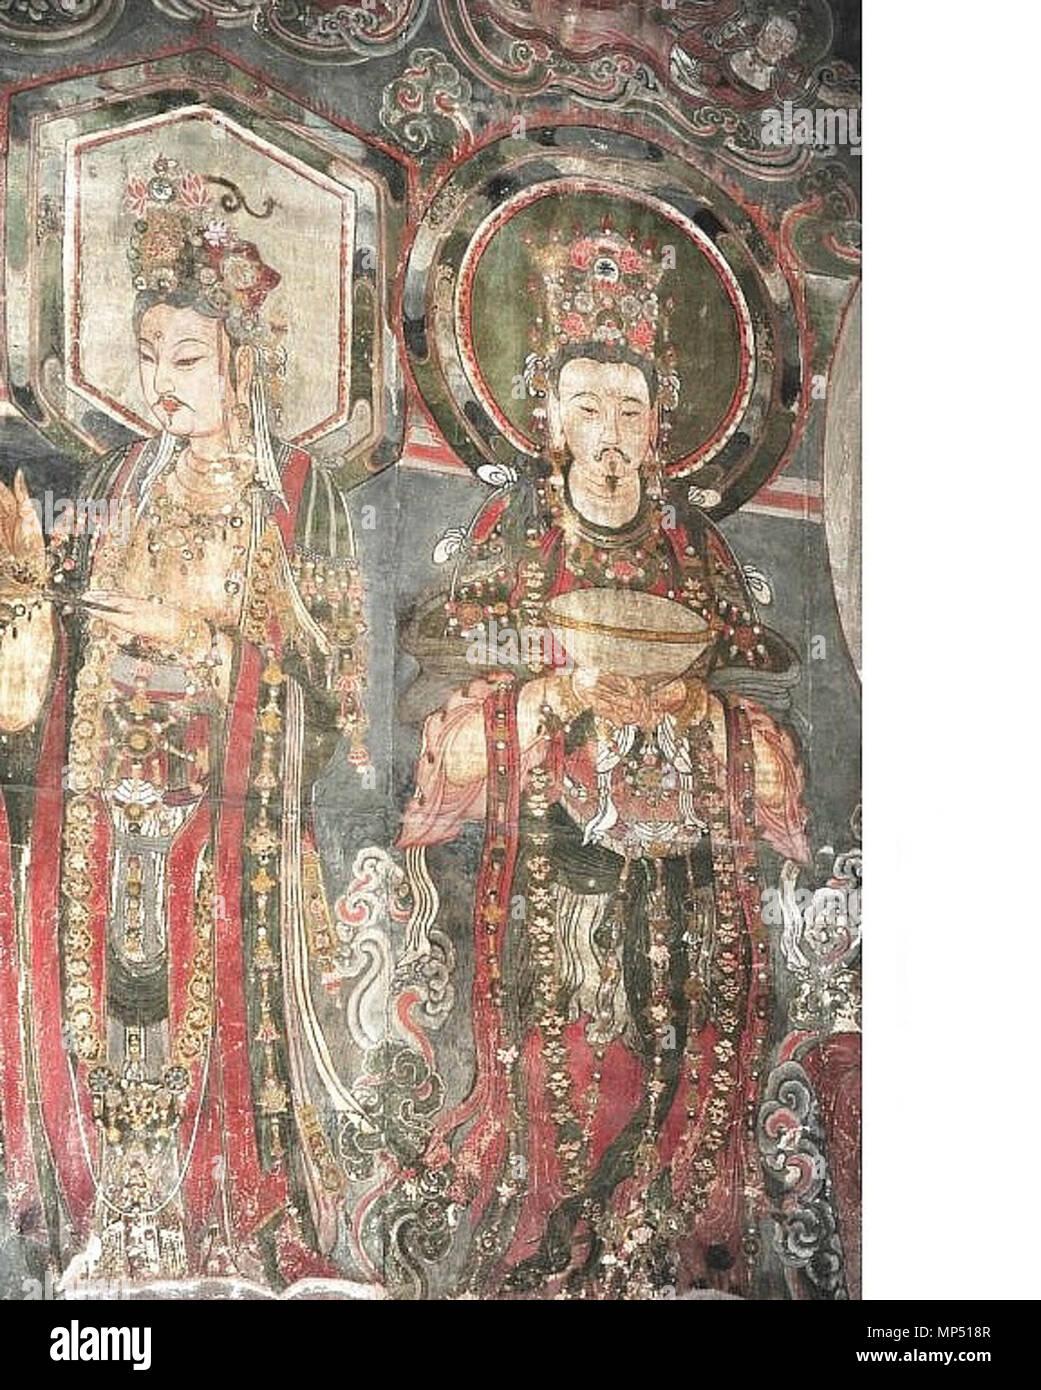 . English: Kin Dynasty (1115-1234) fresco in the Temple of Adoring Bliss (Ch'ung-fu Temple), Shuo-chou, Shansi. Español: Fresco en el Templo de la Adoración de la Prosperidad (Templo Ch'ung-fu), dinastía Kin (1115-1234), Shuo-chóu, Shansí. 5 October 2013, 05:00:11. Unknown artist of Kin Dynasty (1115-1234) 765 Kin Dynasty (1115-1234) fresco in Ch'ung-fu Temple, Shuo-chou 18 - Stock Image